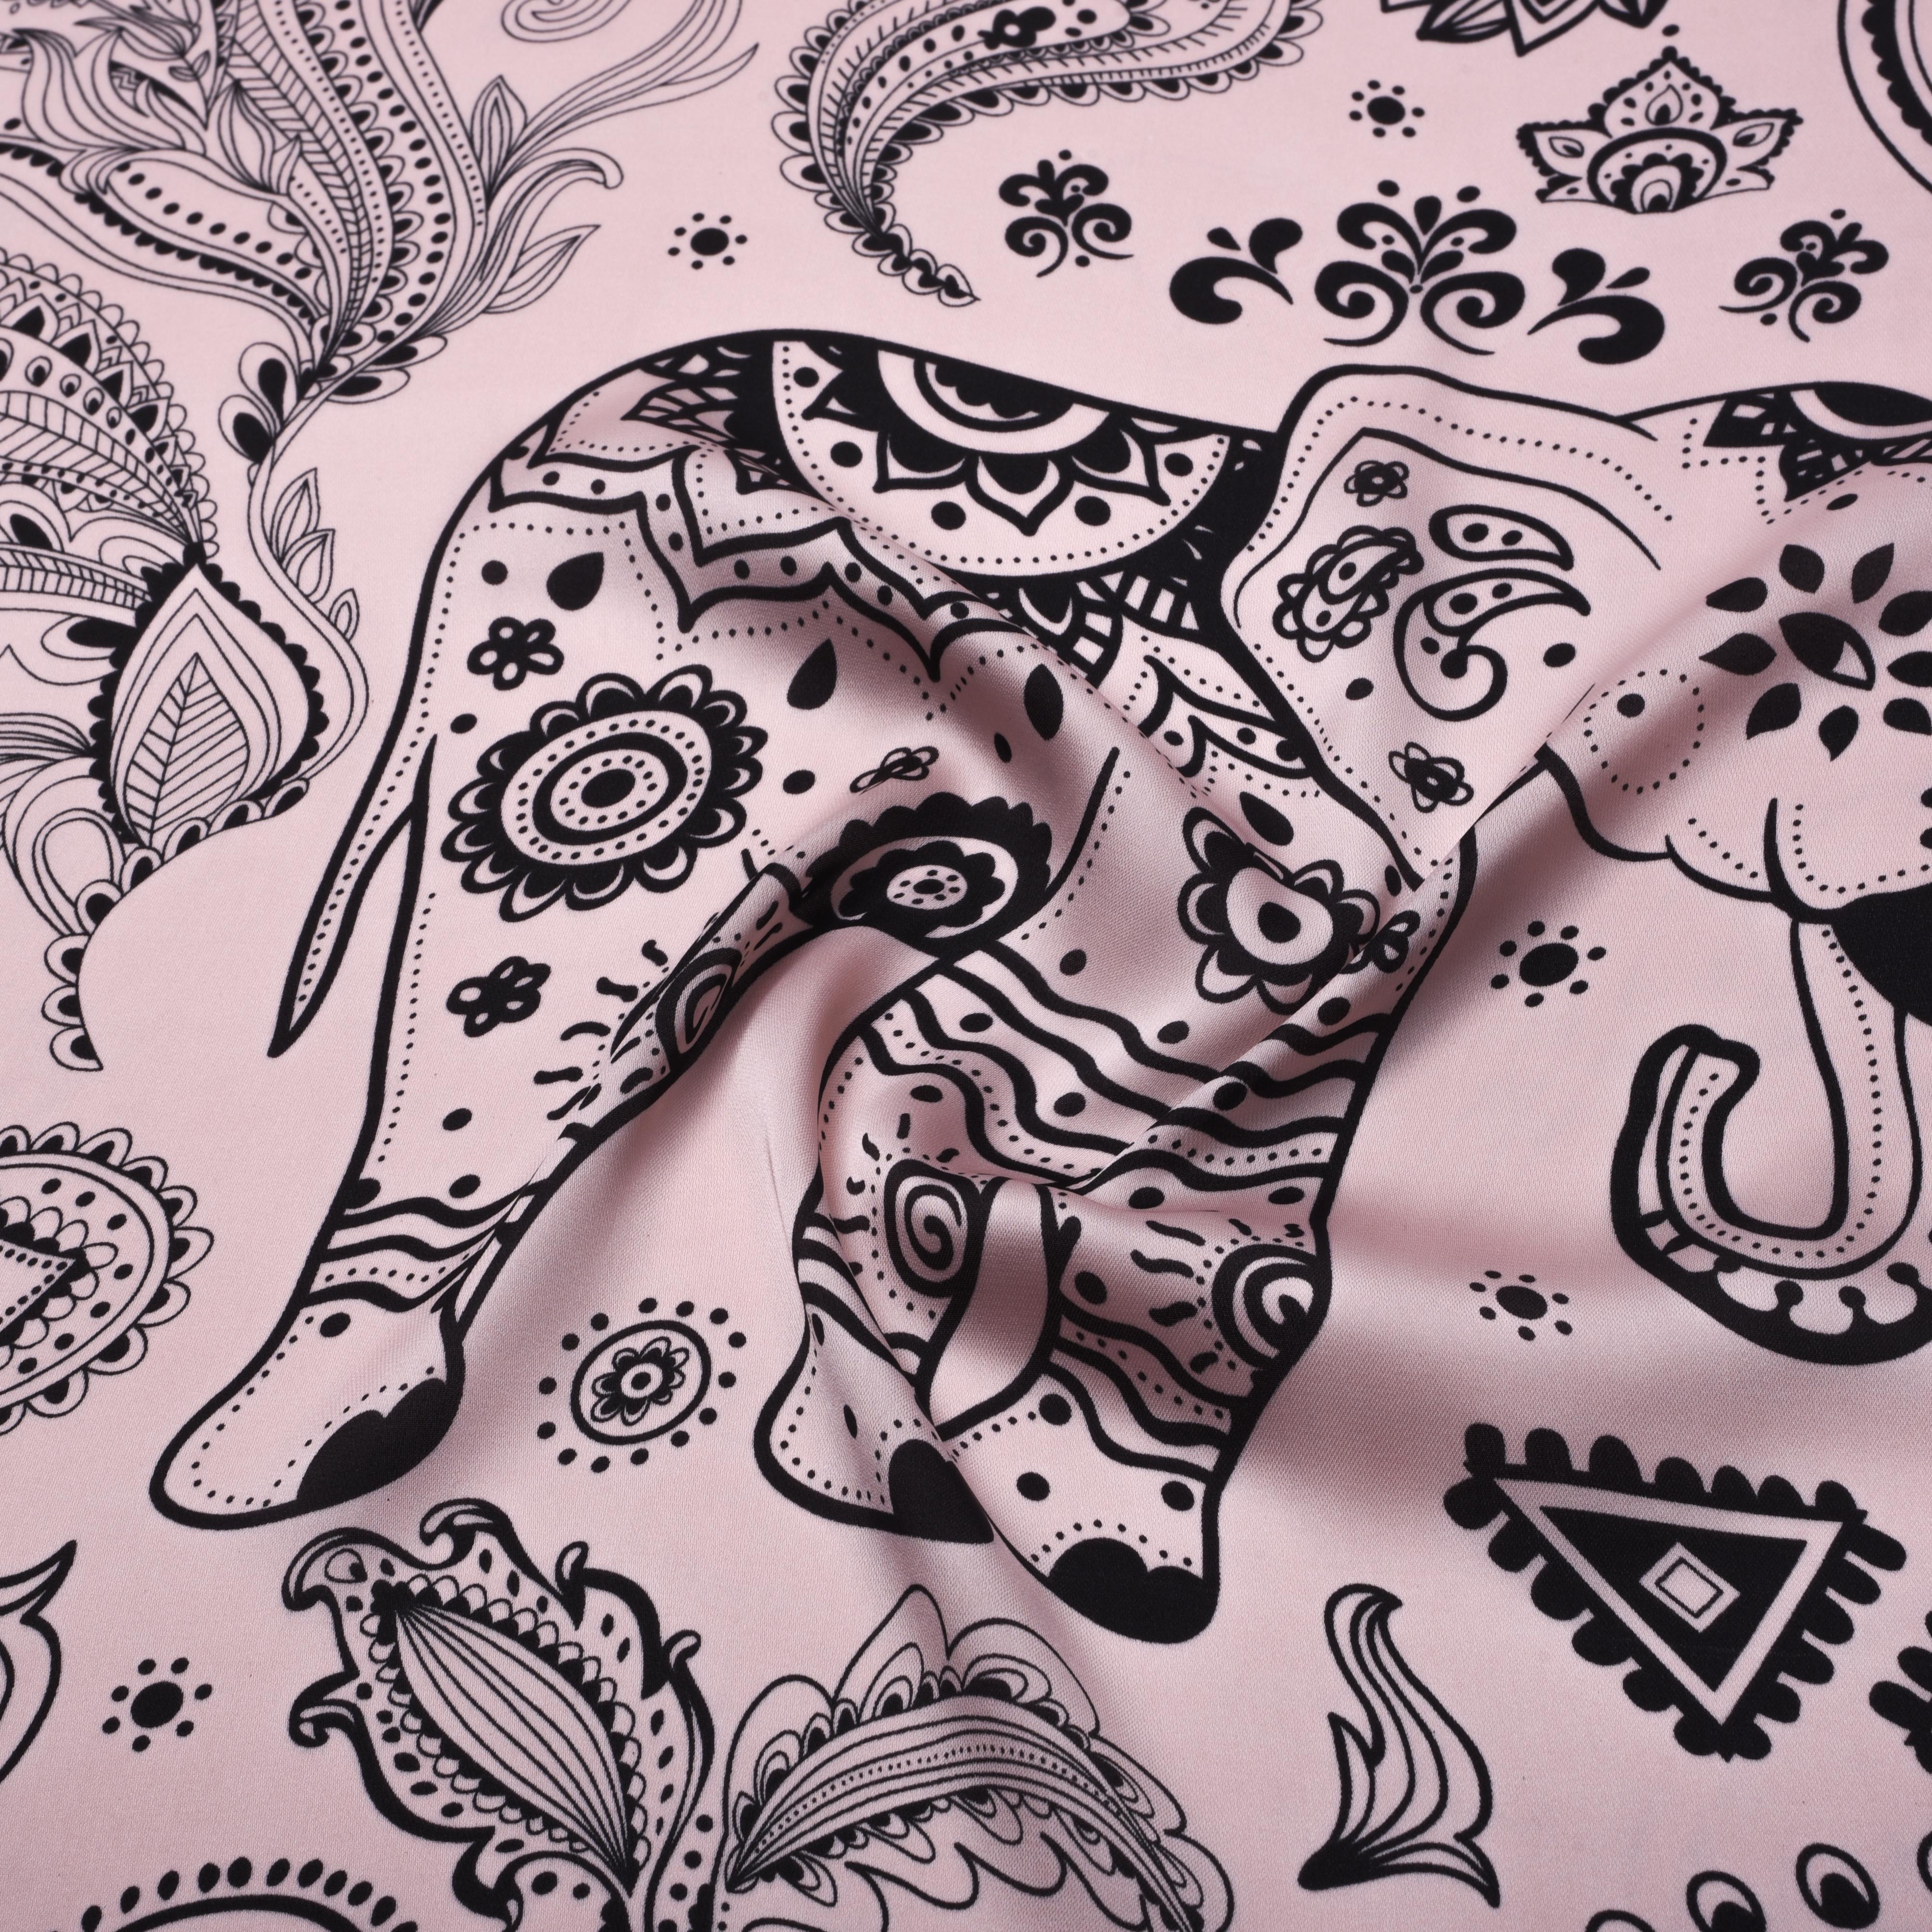 4016x4016 7575cm Silk Feeling Square Scarf Women Animal Elephent Pattern